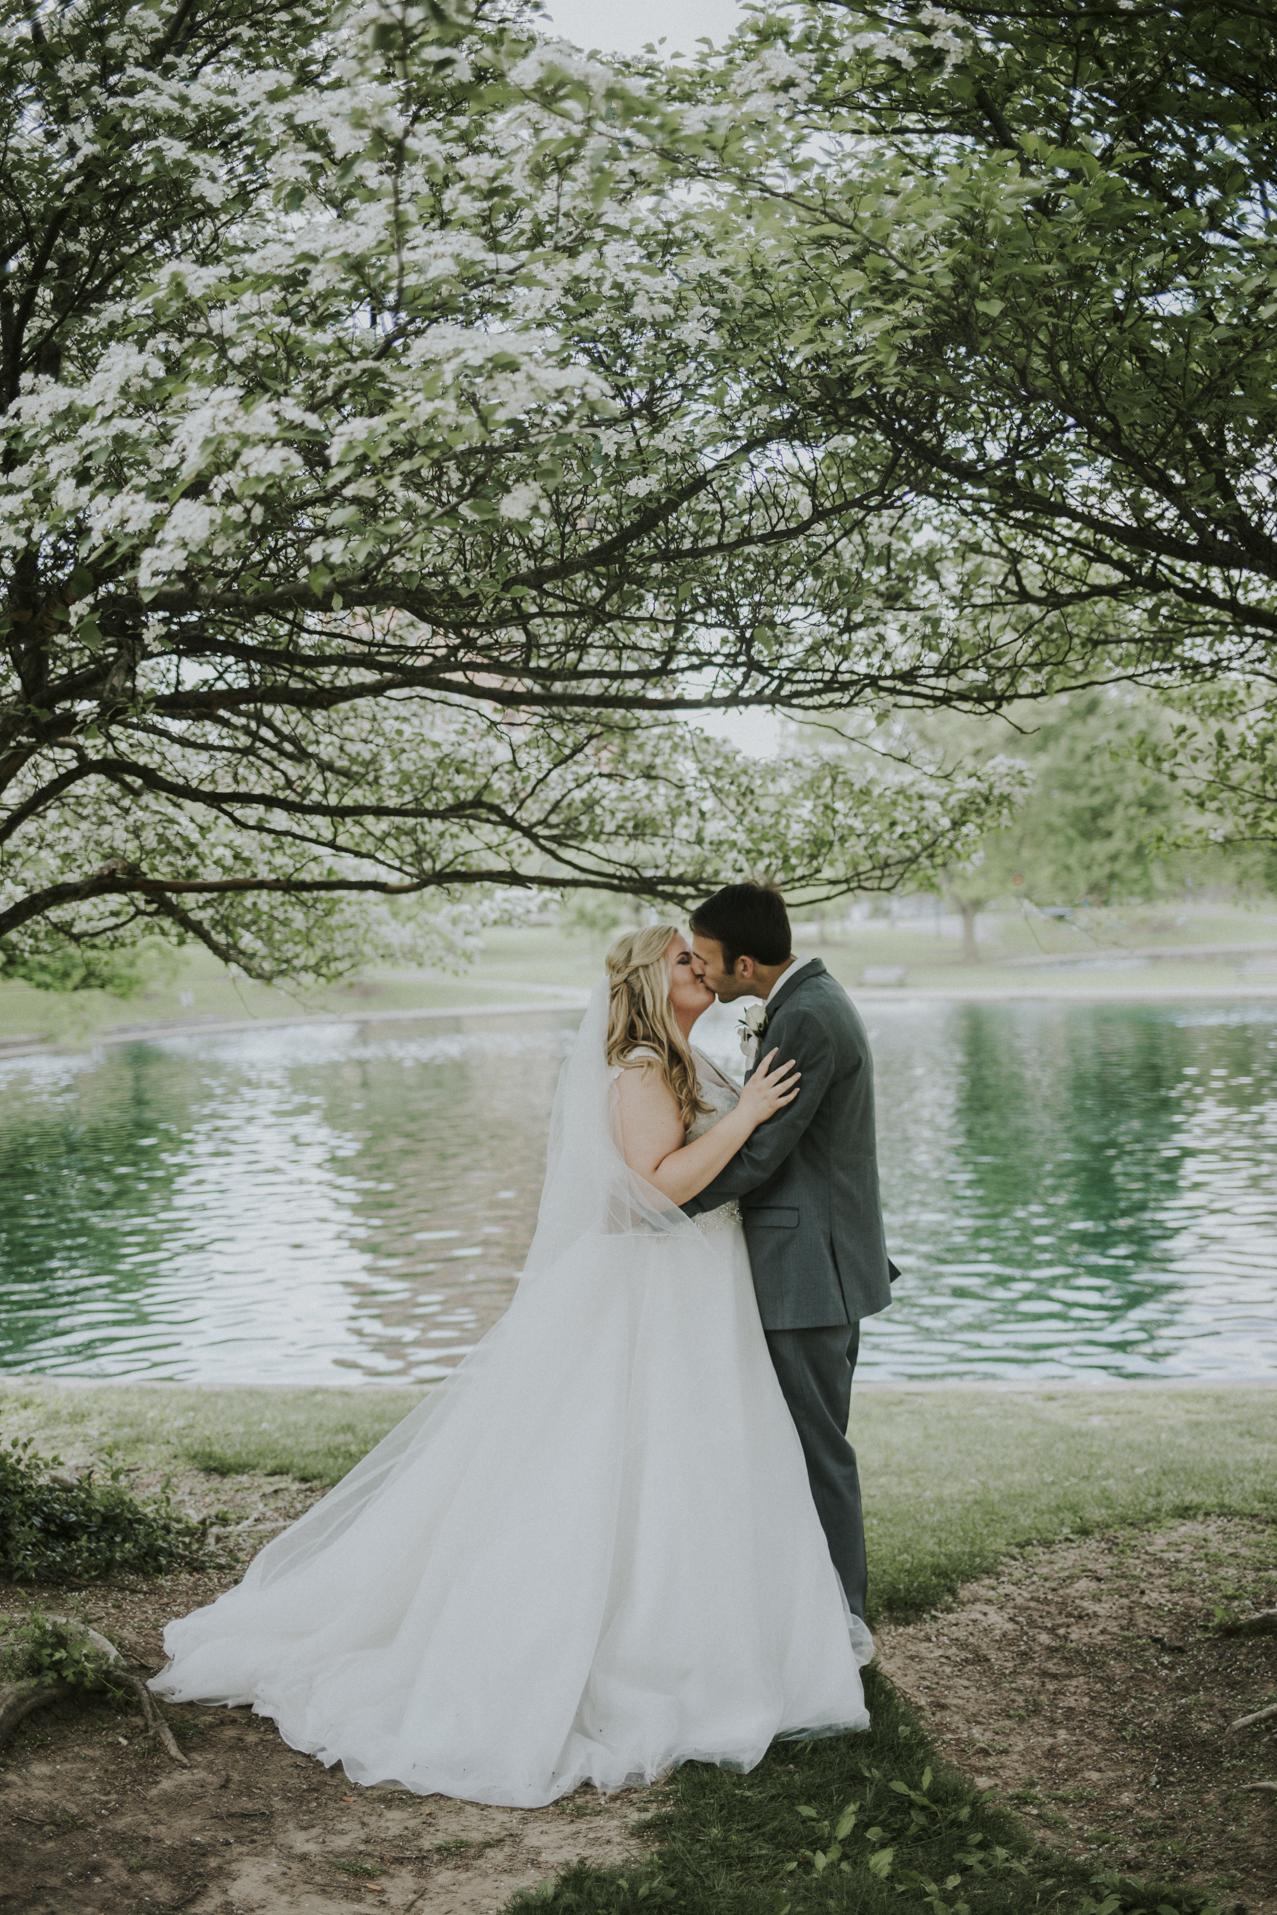 Bride and Groom Portraits Kaylen and Eric's Romantic Countryside Wedding in Cincinnati, Ohio